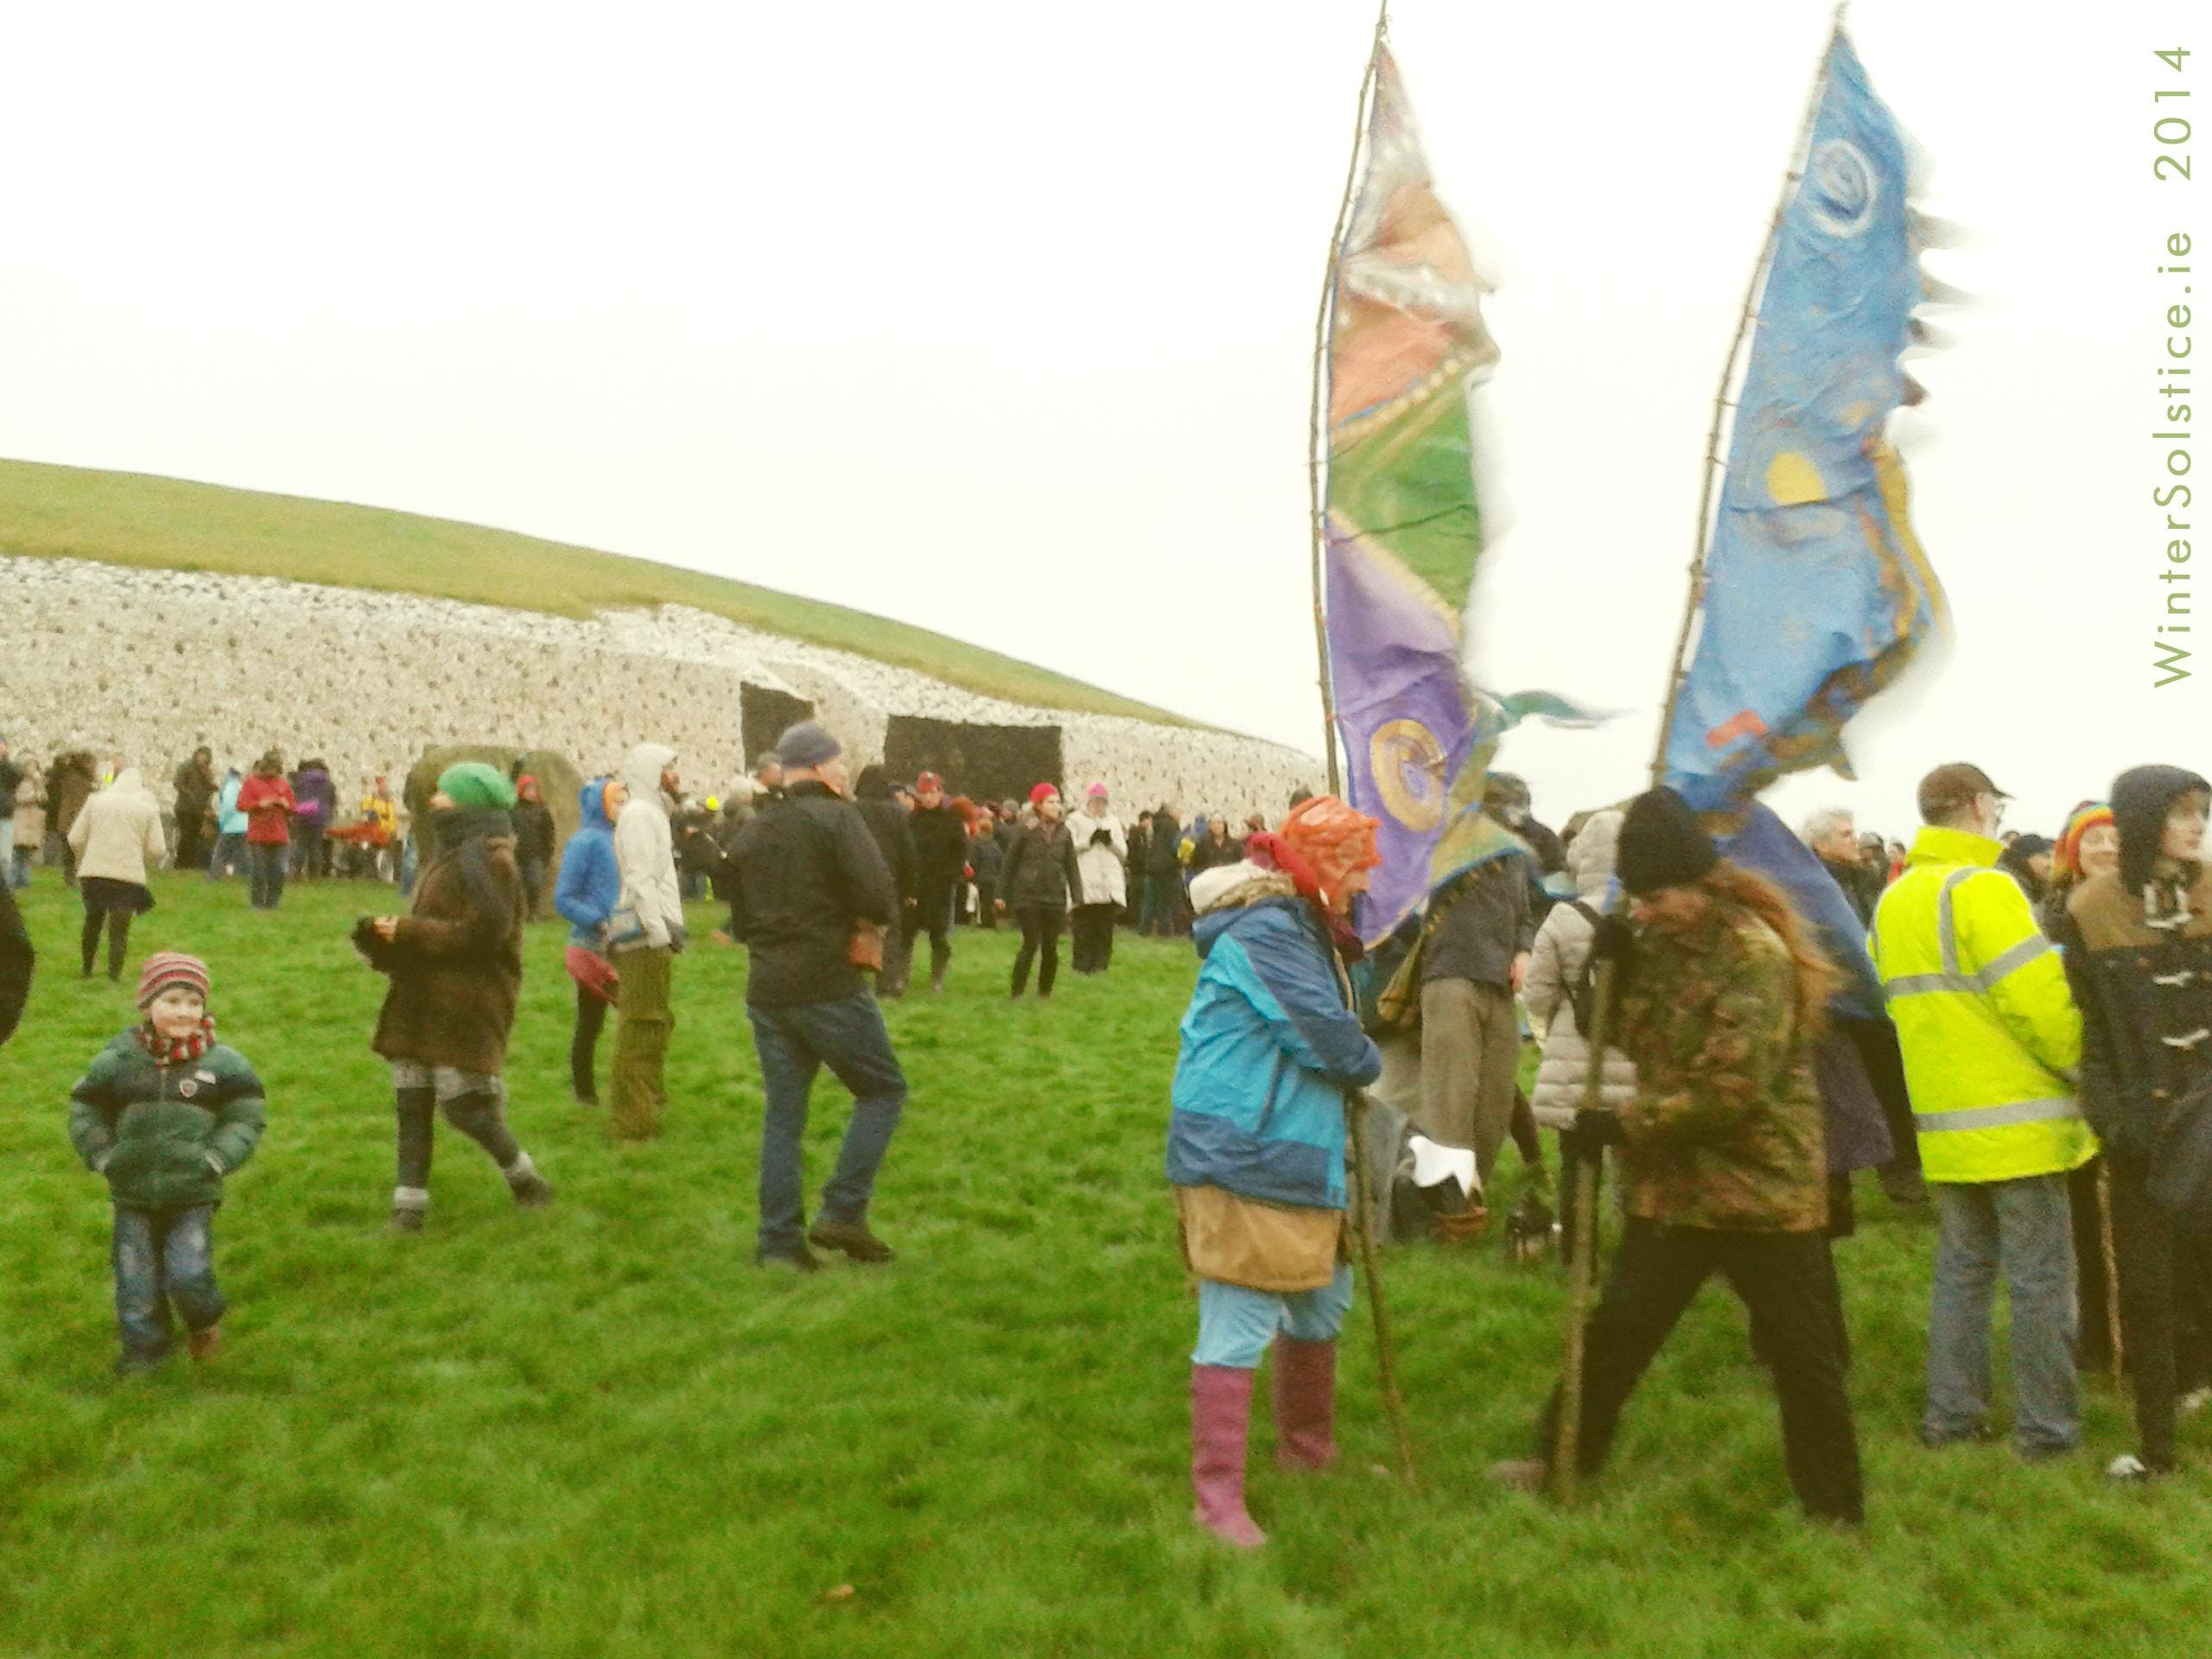 Winter Solstice Newgrange, Ireland - our beloved Community gathering: Darkness into Light